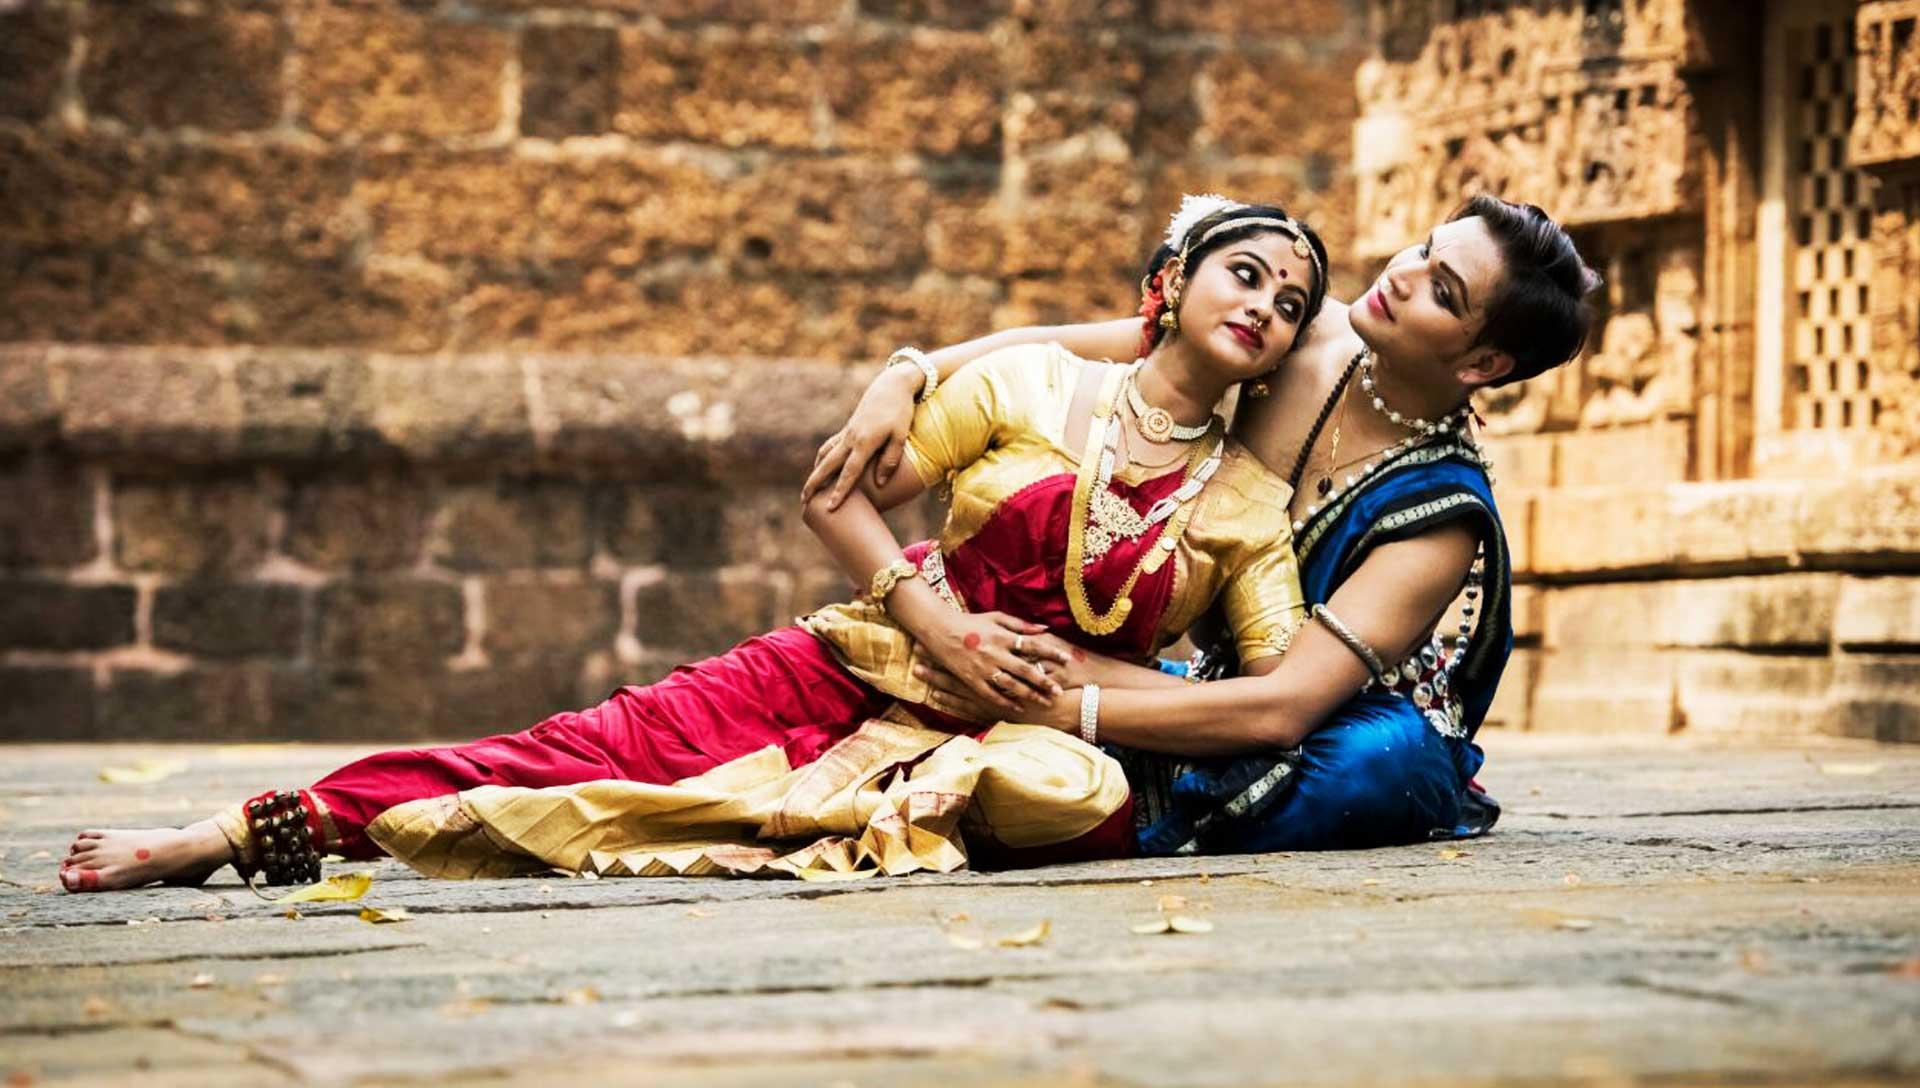 Saswat Joshi, Odisha's Aekalavya Dance Festival & Saswat Joshi To Spell The Magic In Singapore Next Week & We're Excited To See The Response!